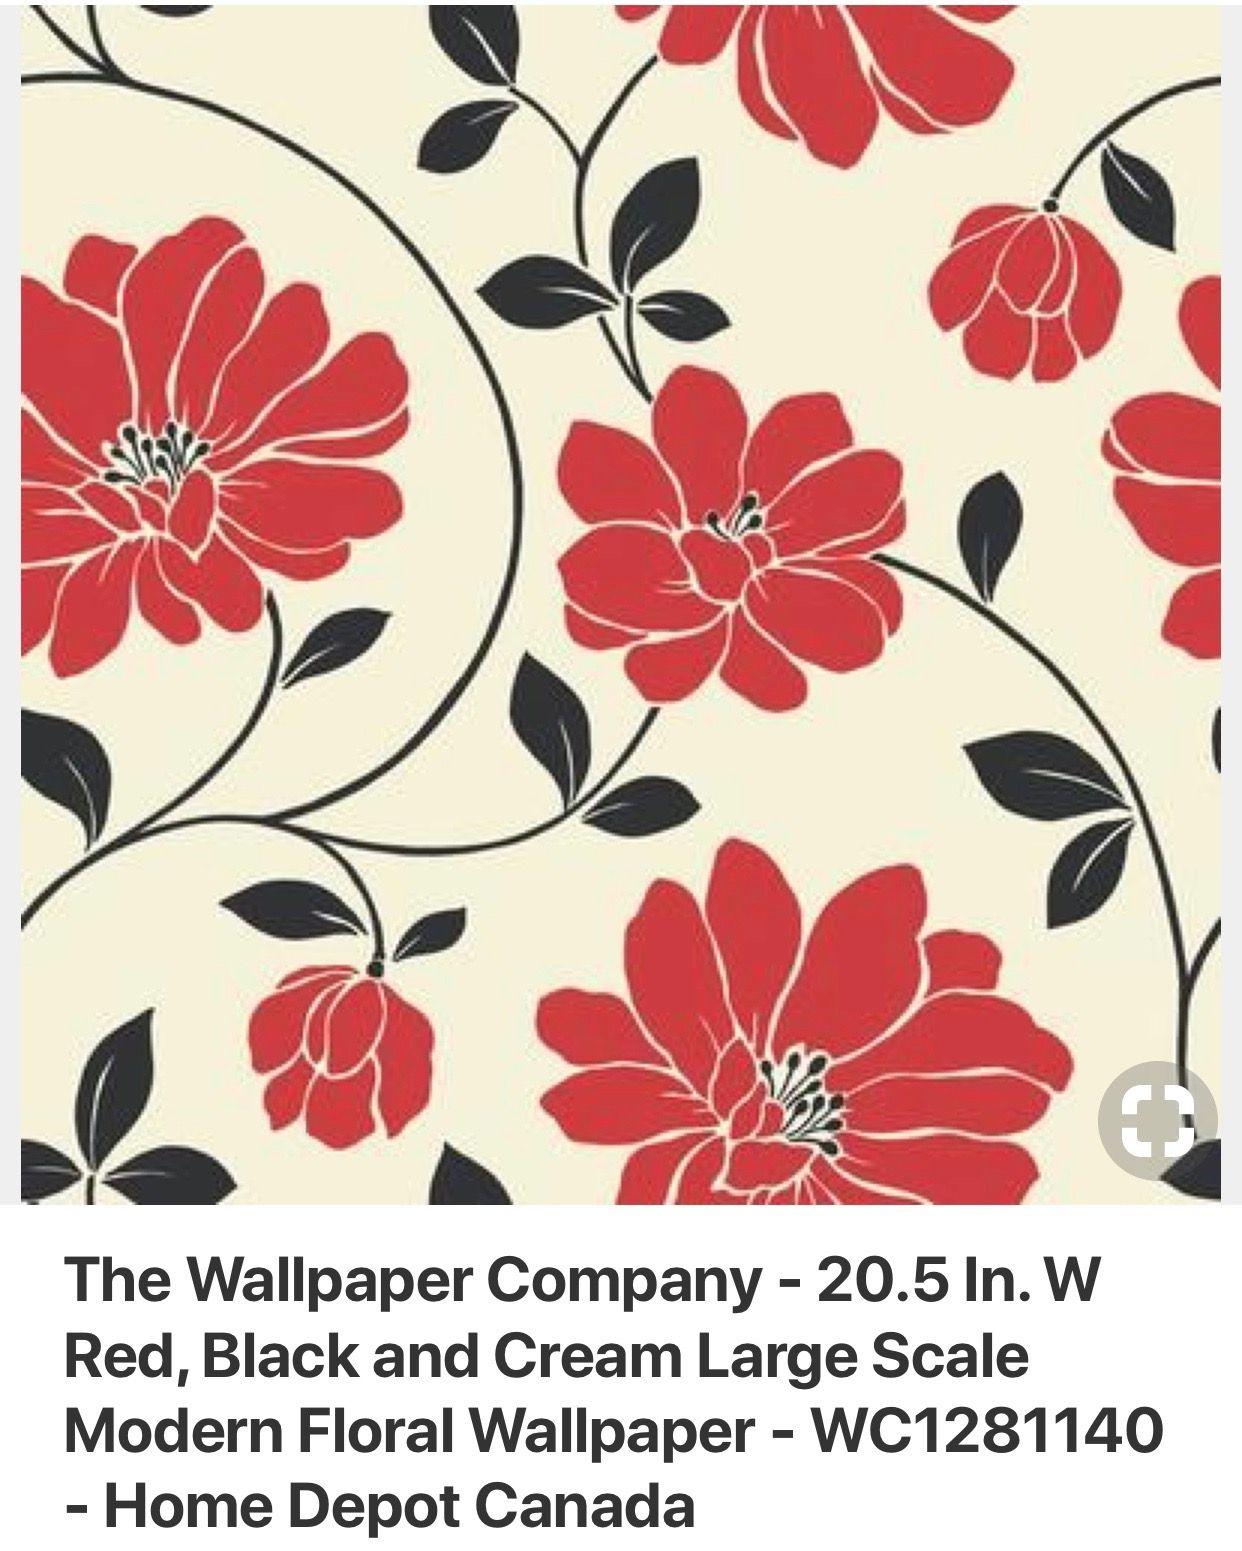 Pin By Kari Spendlove On Red Wallpaper Modern Floral Wallpaper Wallpaper Companies Floral Wallpaper